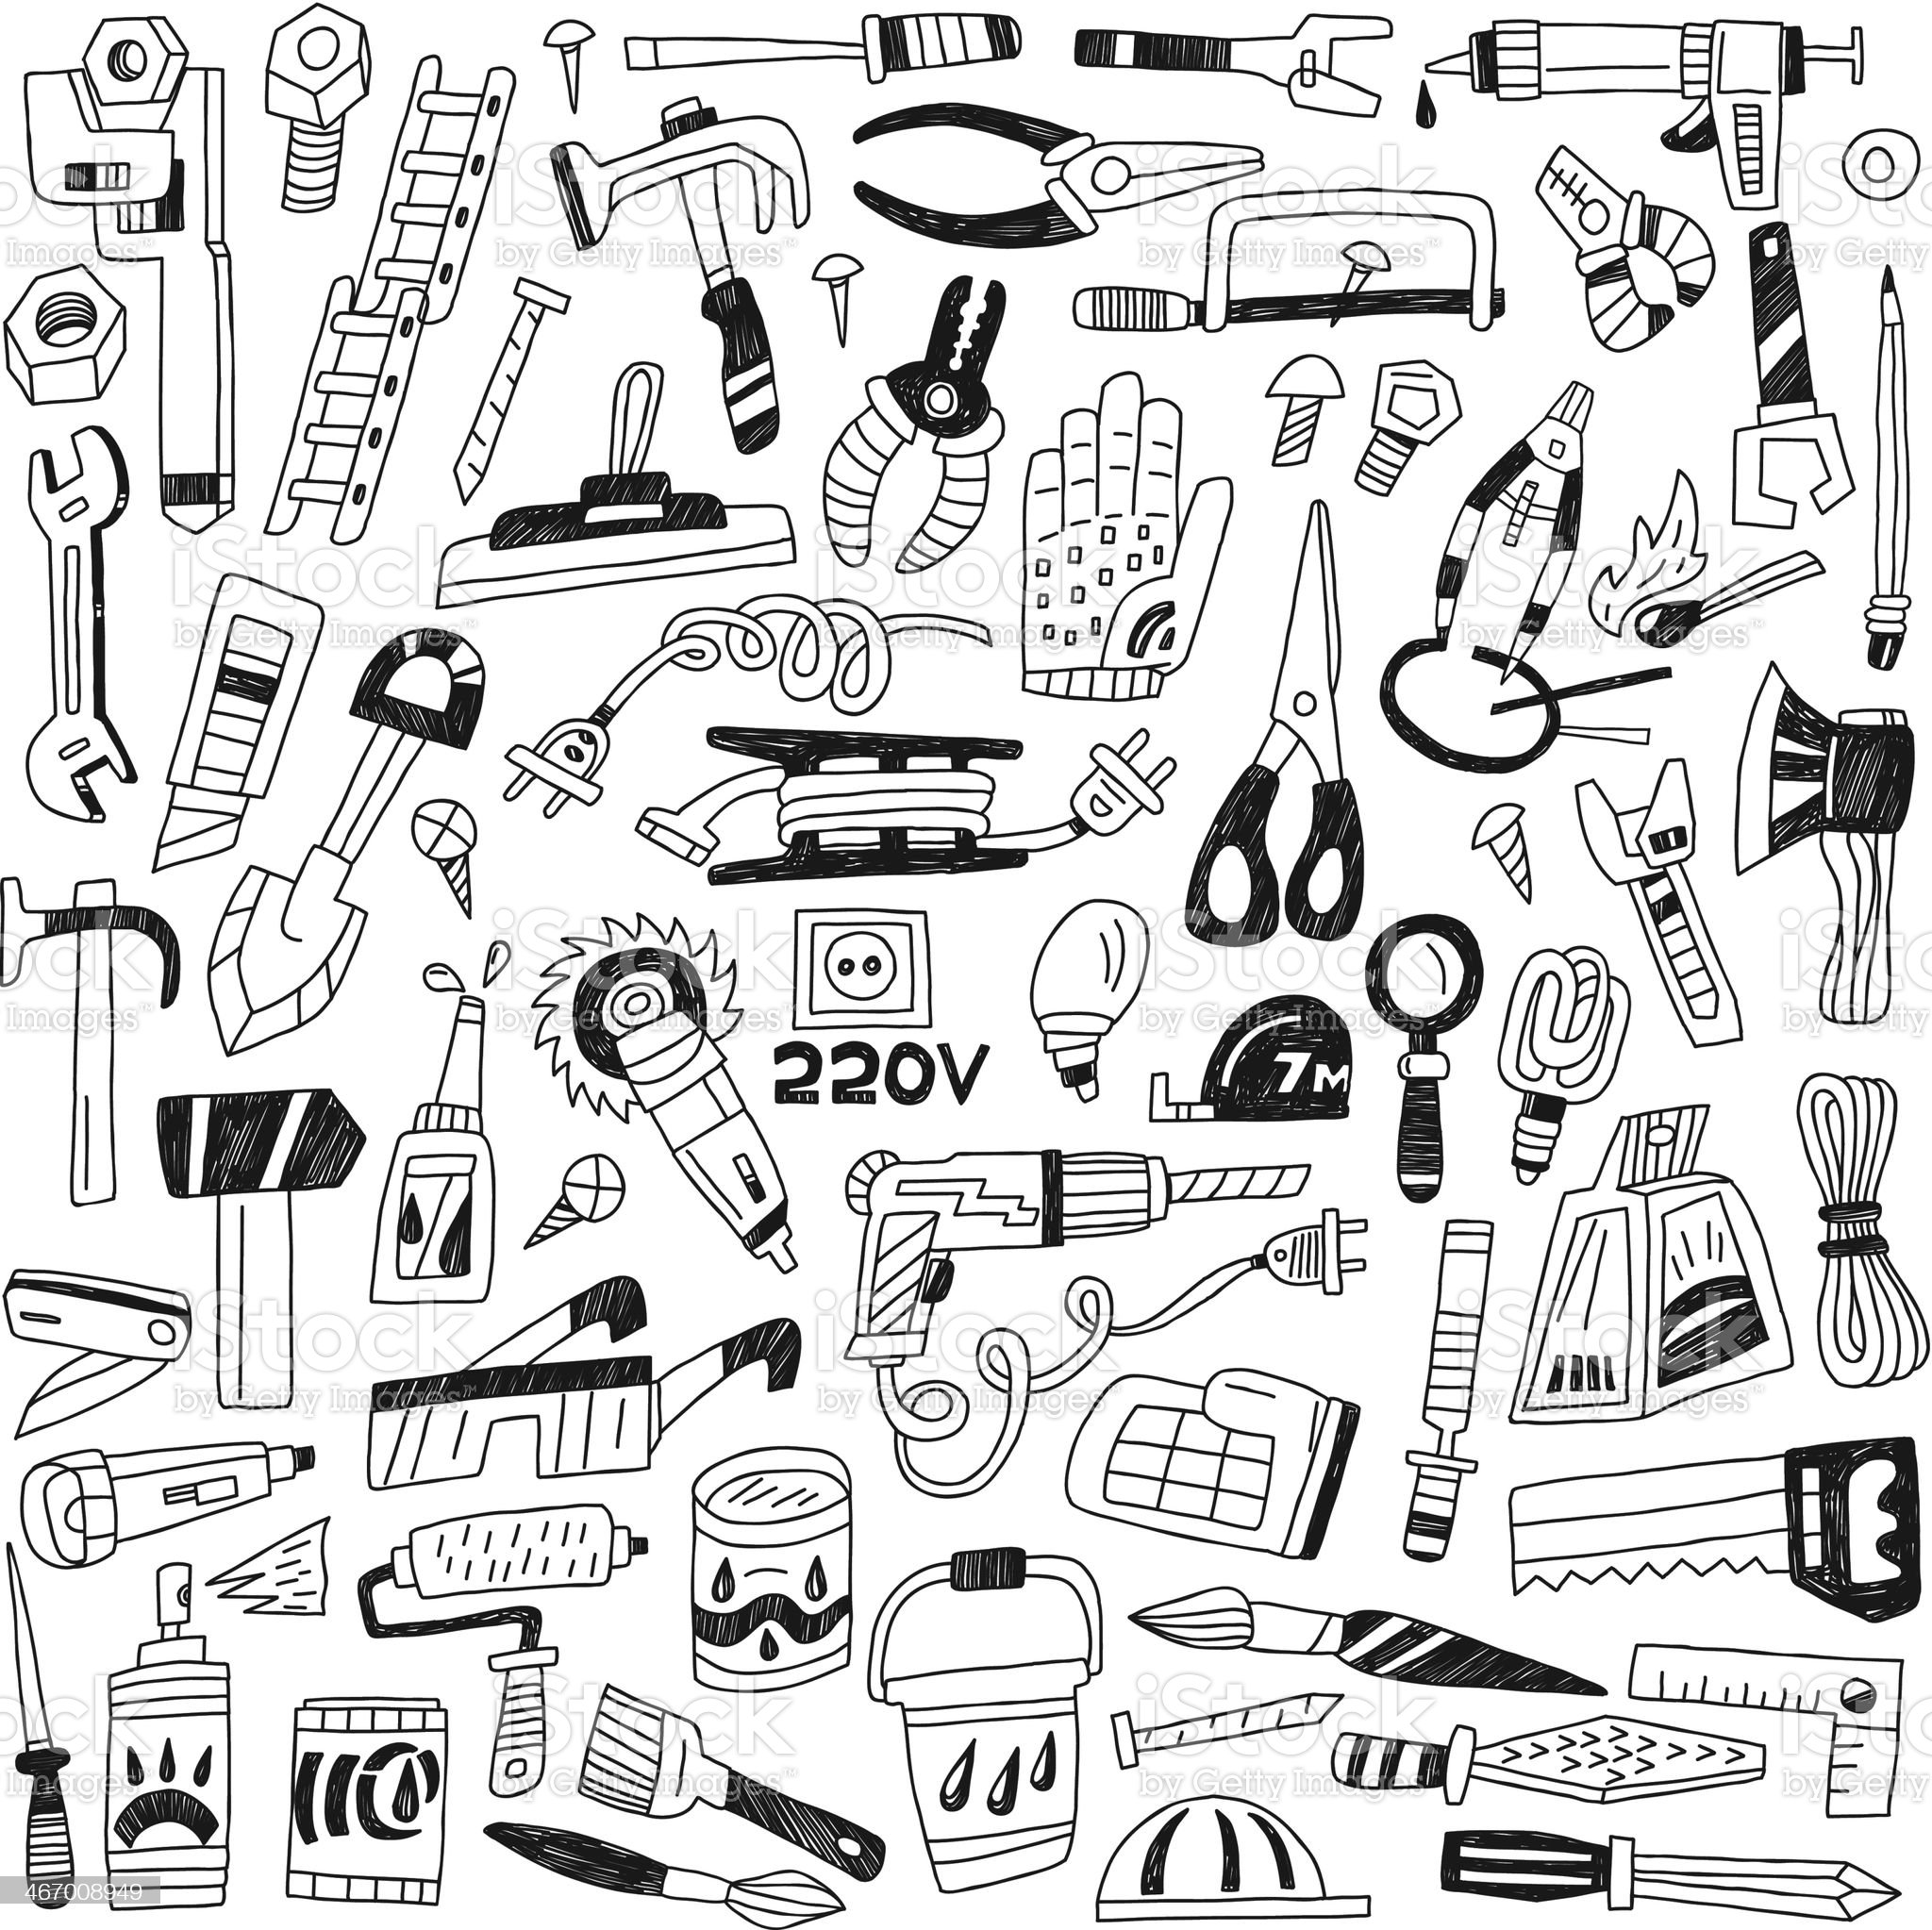 work tools - doodles royalty-free stock vector art